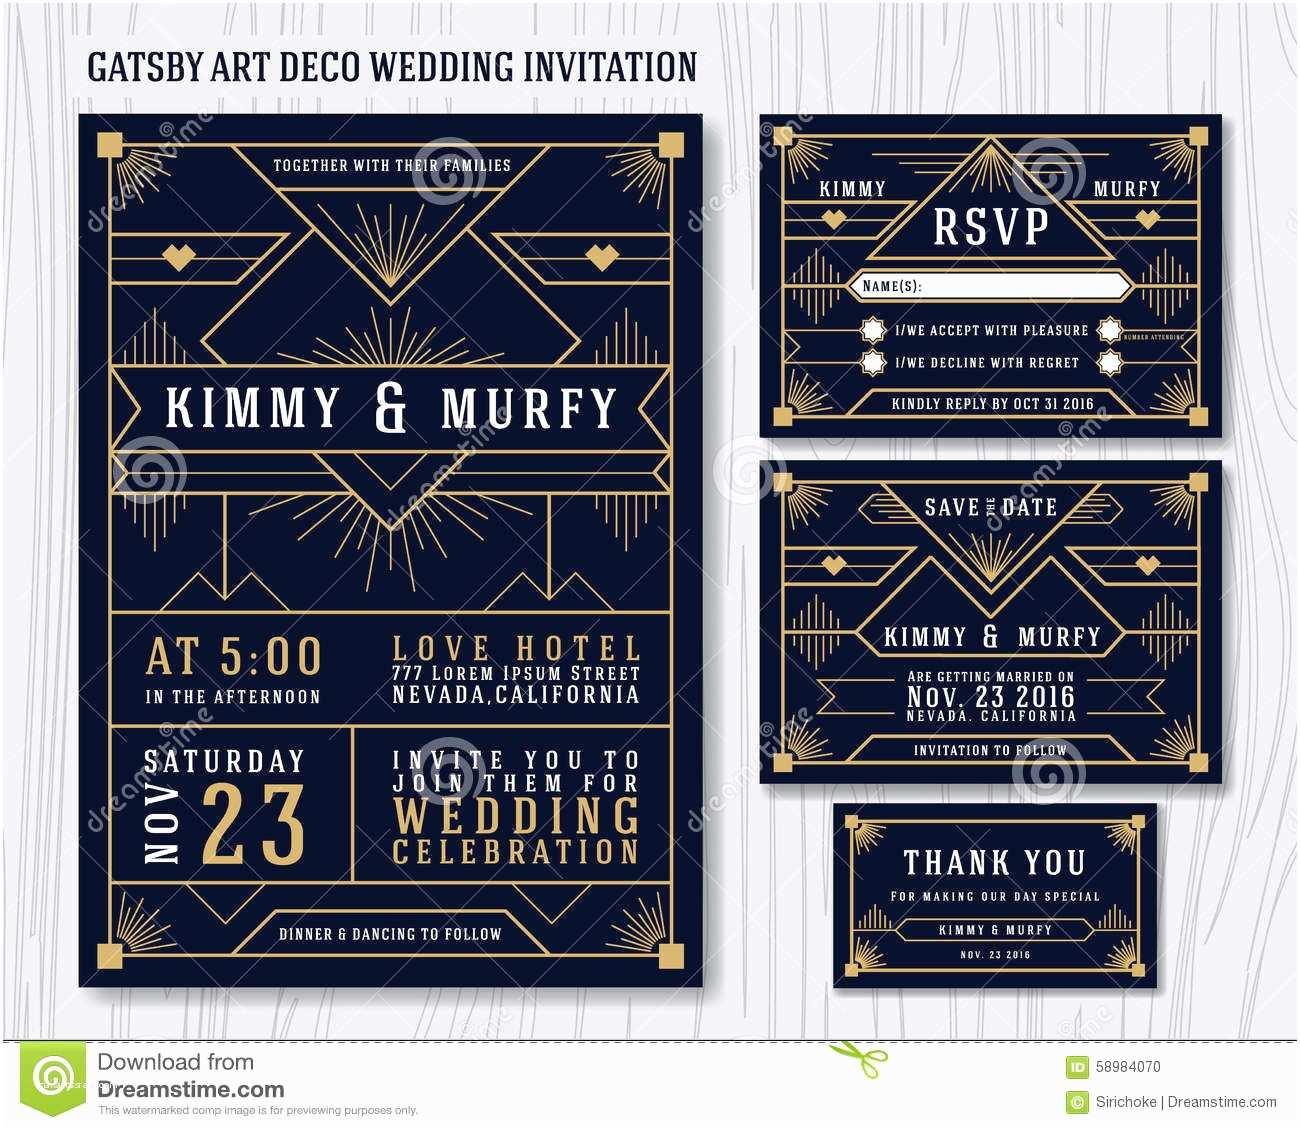 Art Deco Wedding Invitations Free Download Great Gatsby Art Deco Wedding Invitation Design Template